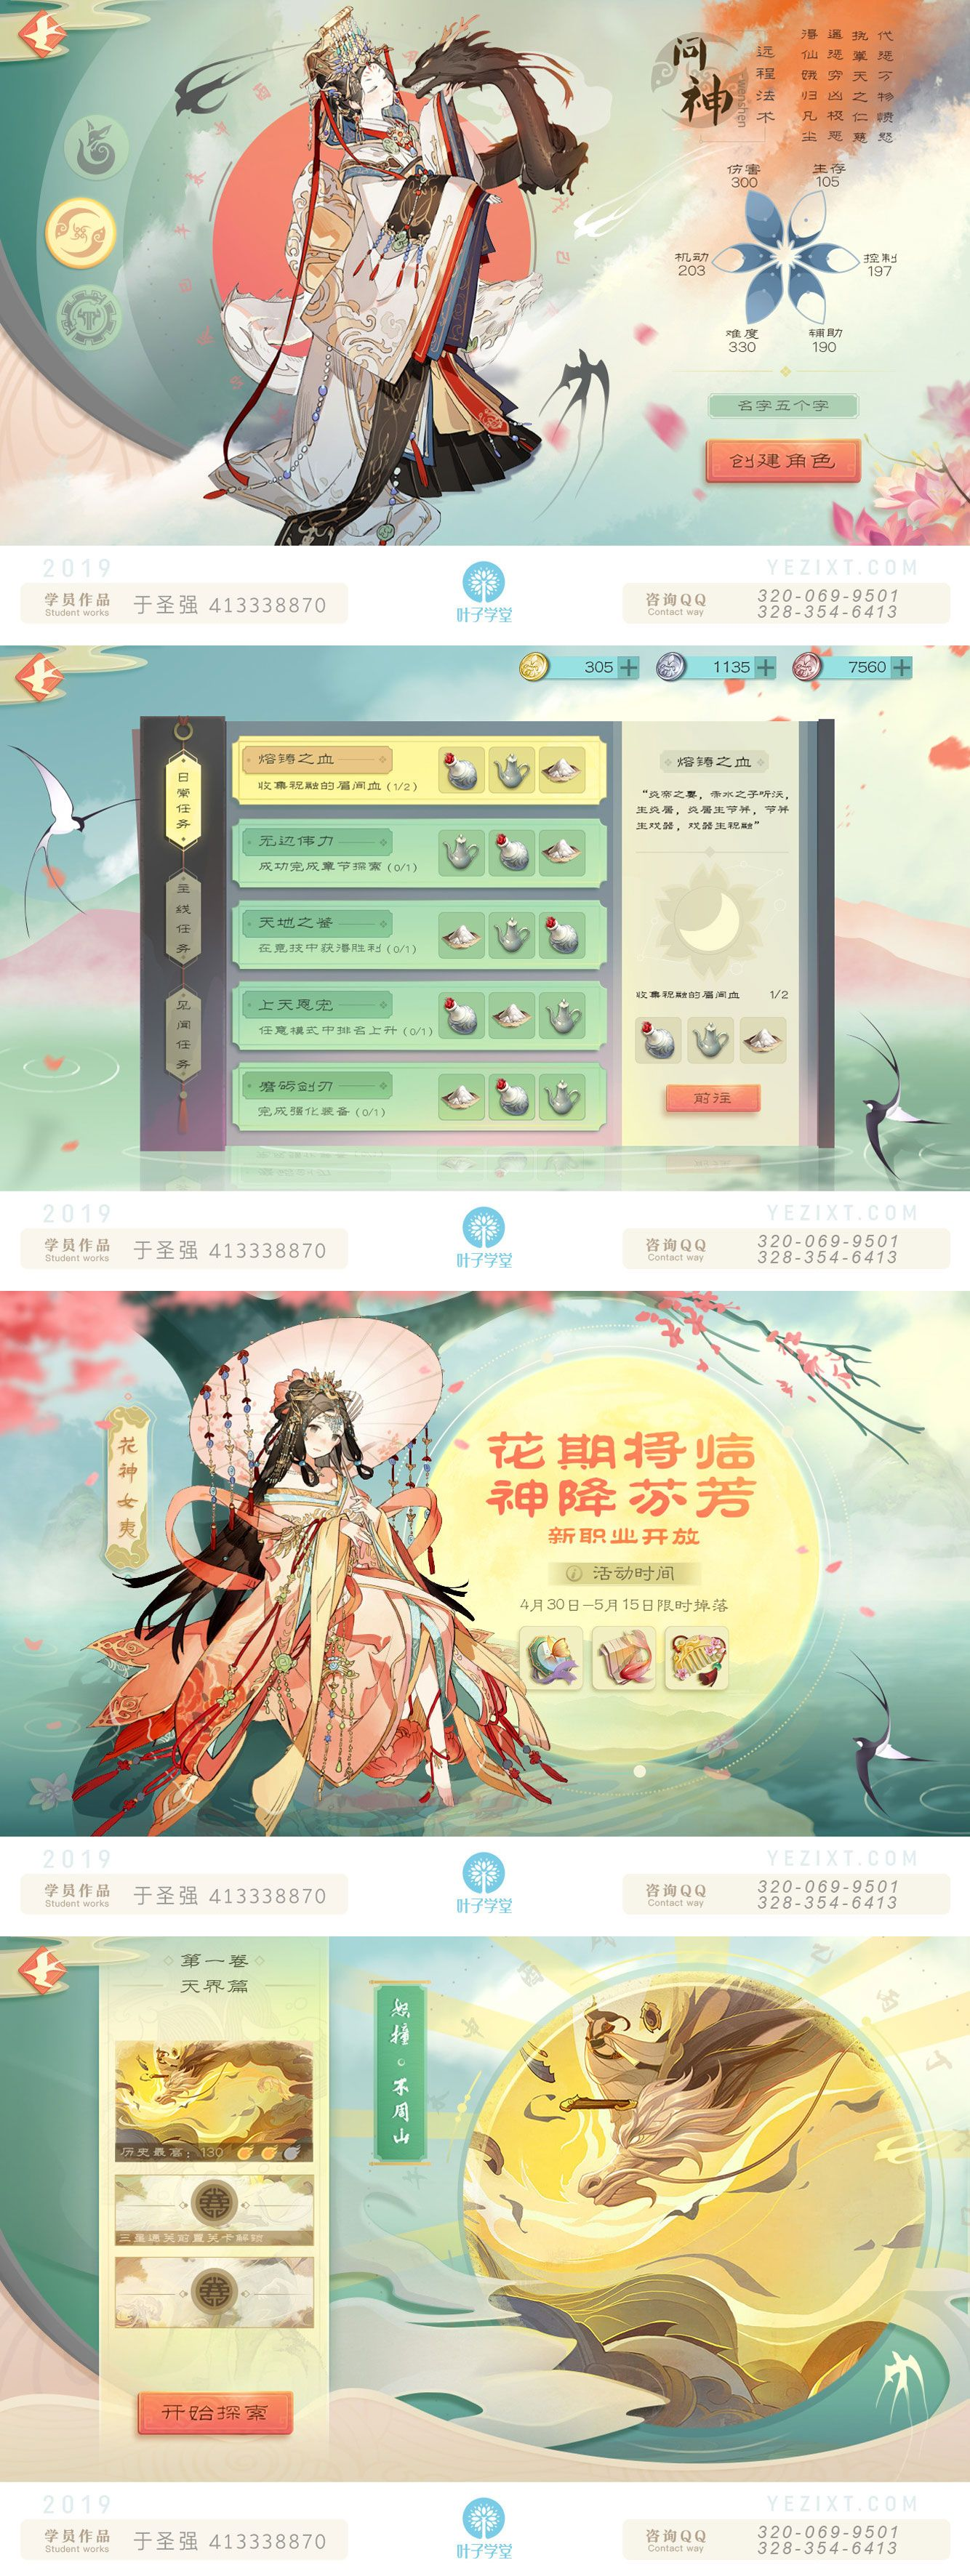 gameui 微信公众号: 叶子学堂   QQ交流群:698313227 #gameinterface